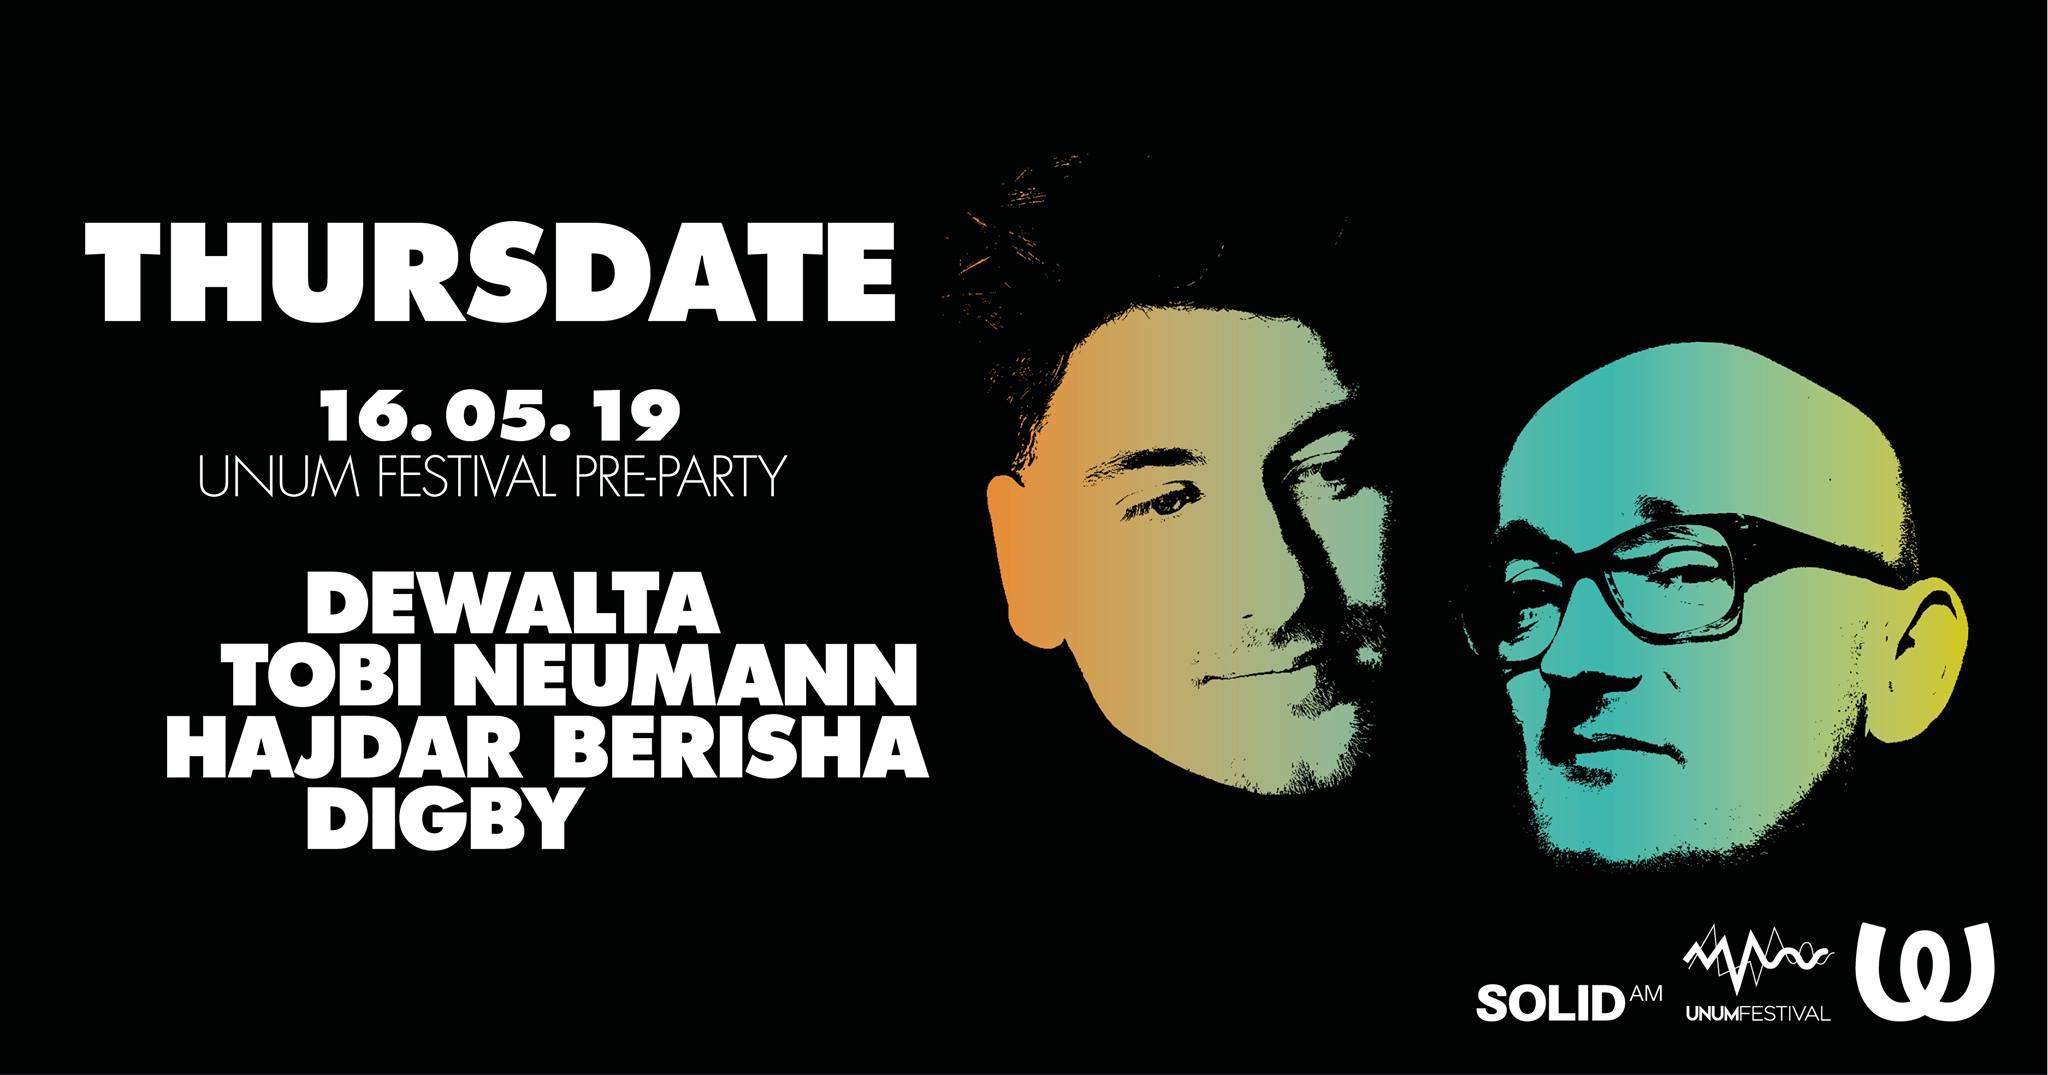 UNUM Pre-Party in Berlin w/ Dewalta, Tobi Neumann, Hadjar Berisha & Digby